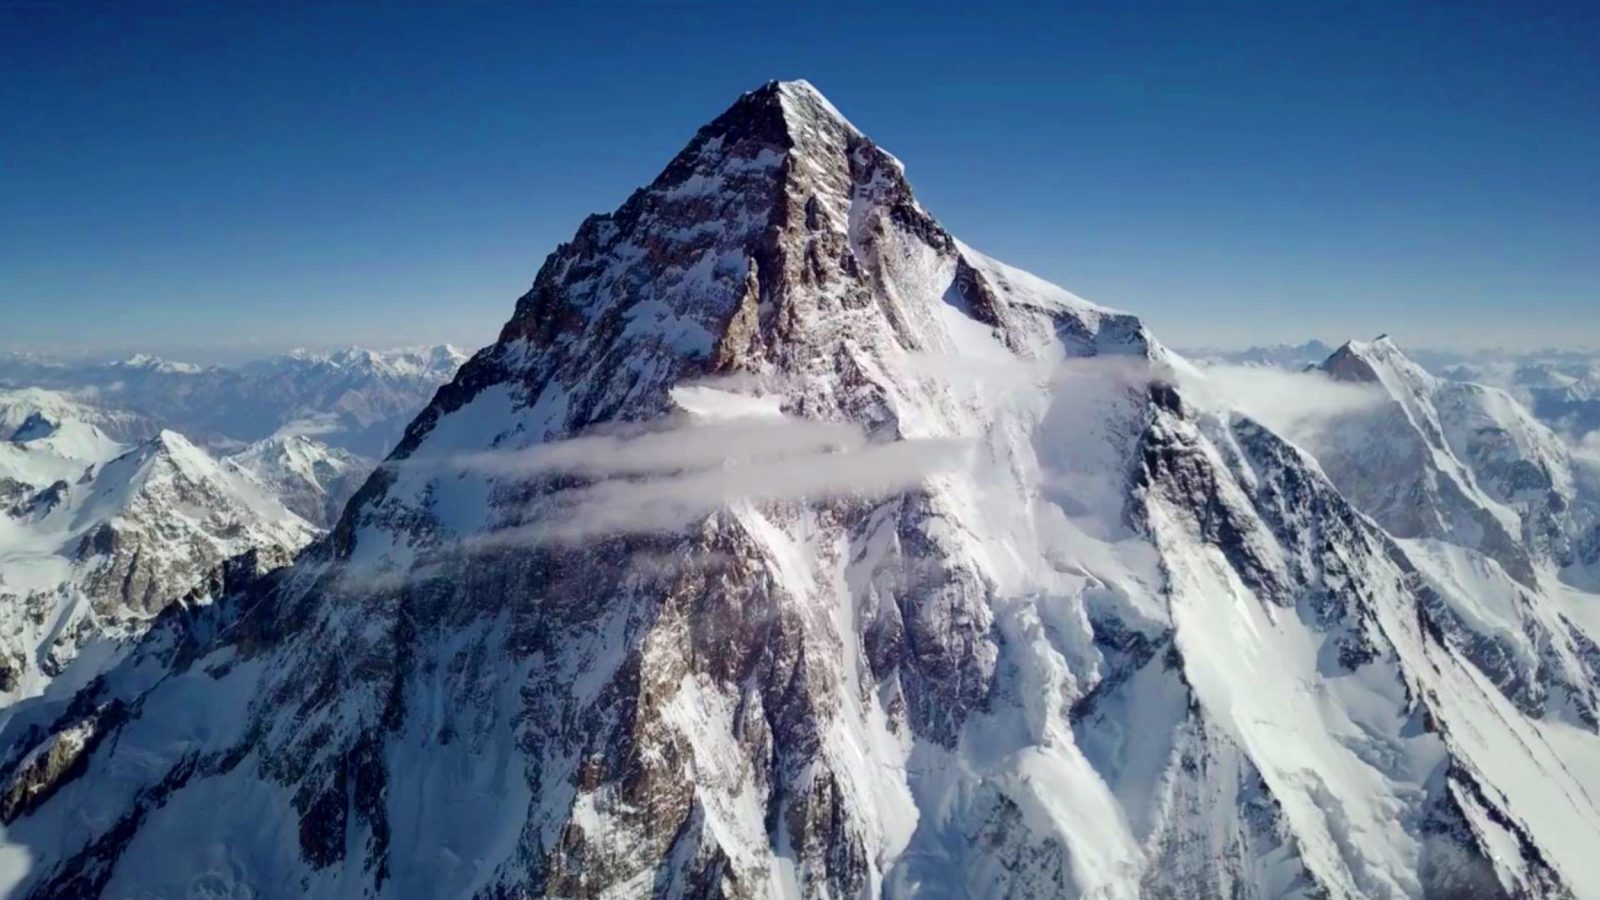 DJI Mavic Pro takes photo of K2 mountain at 8,400m or 27,600